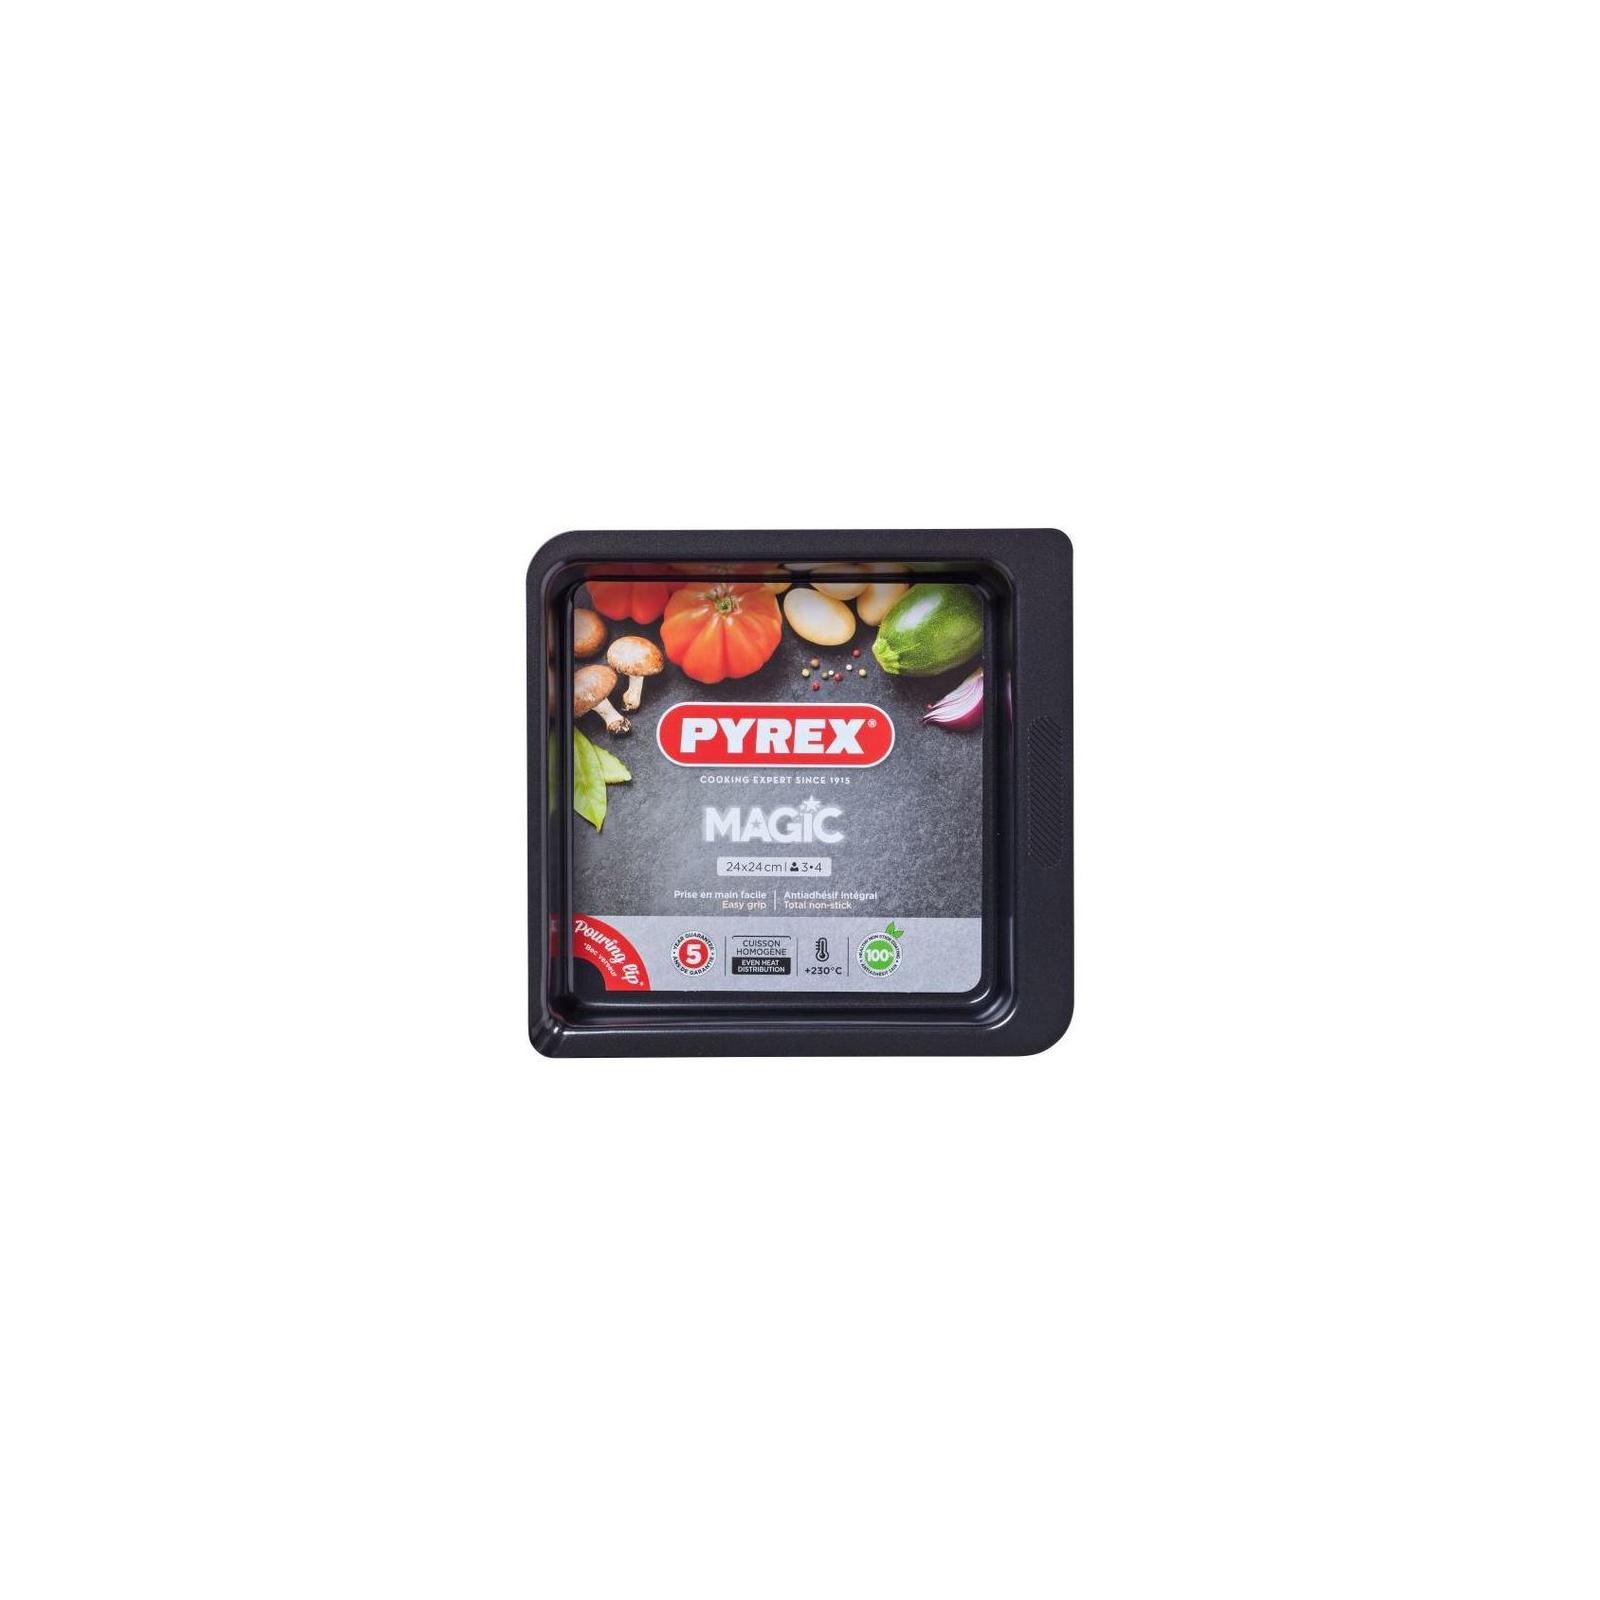 Форма для выпечки Pyrex Magic 24 х 24 см квадратная (MG24SR6)